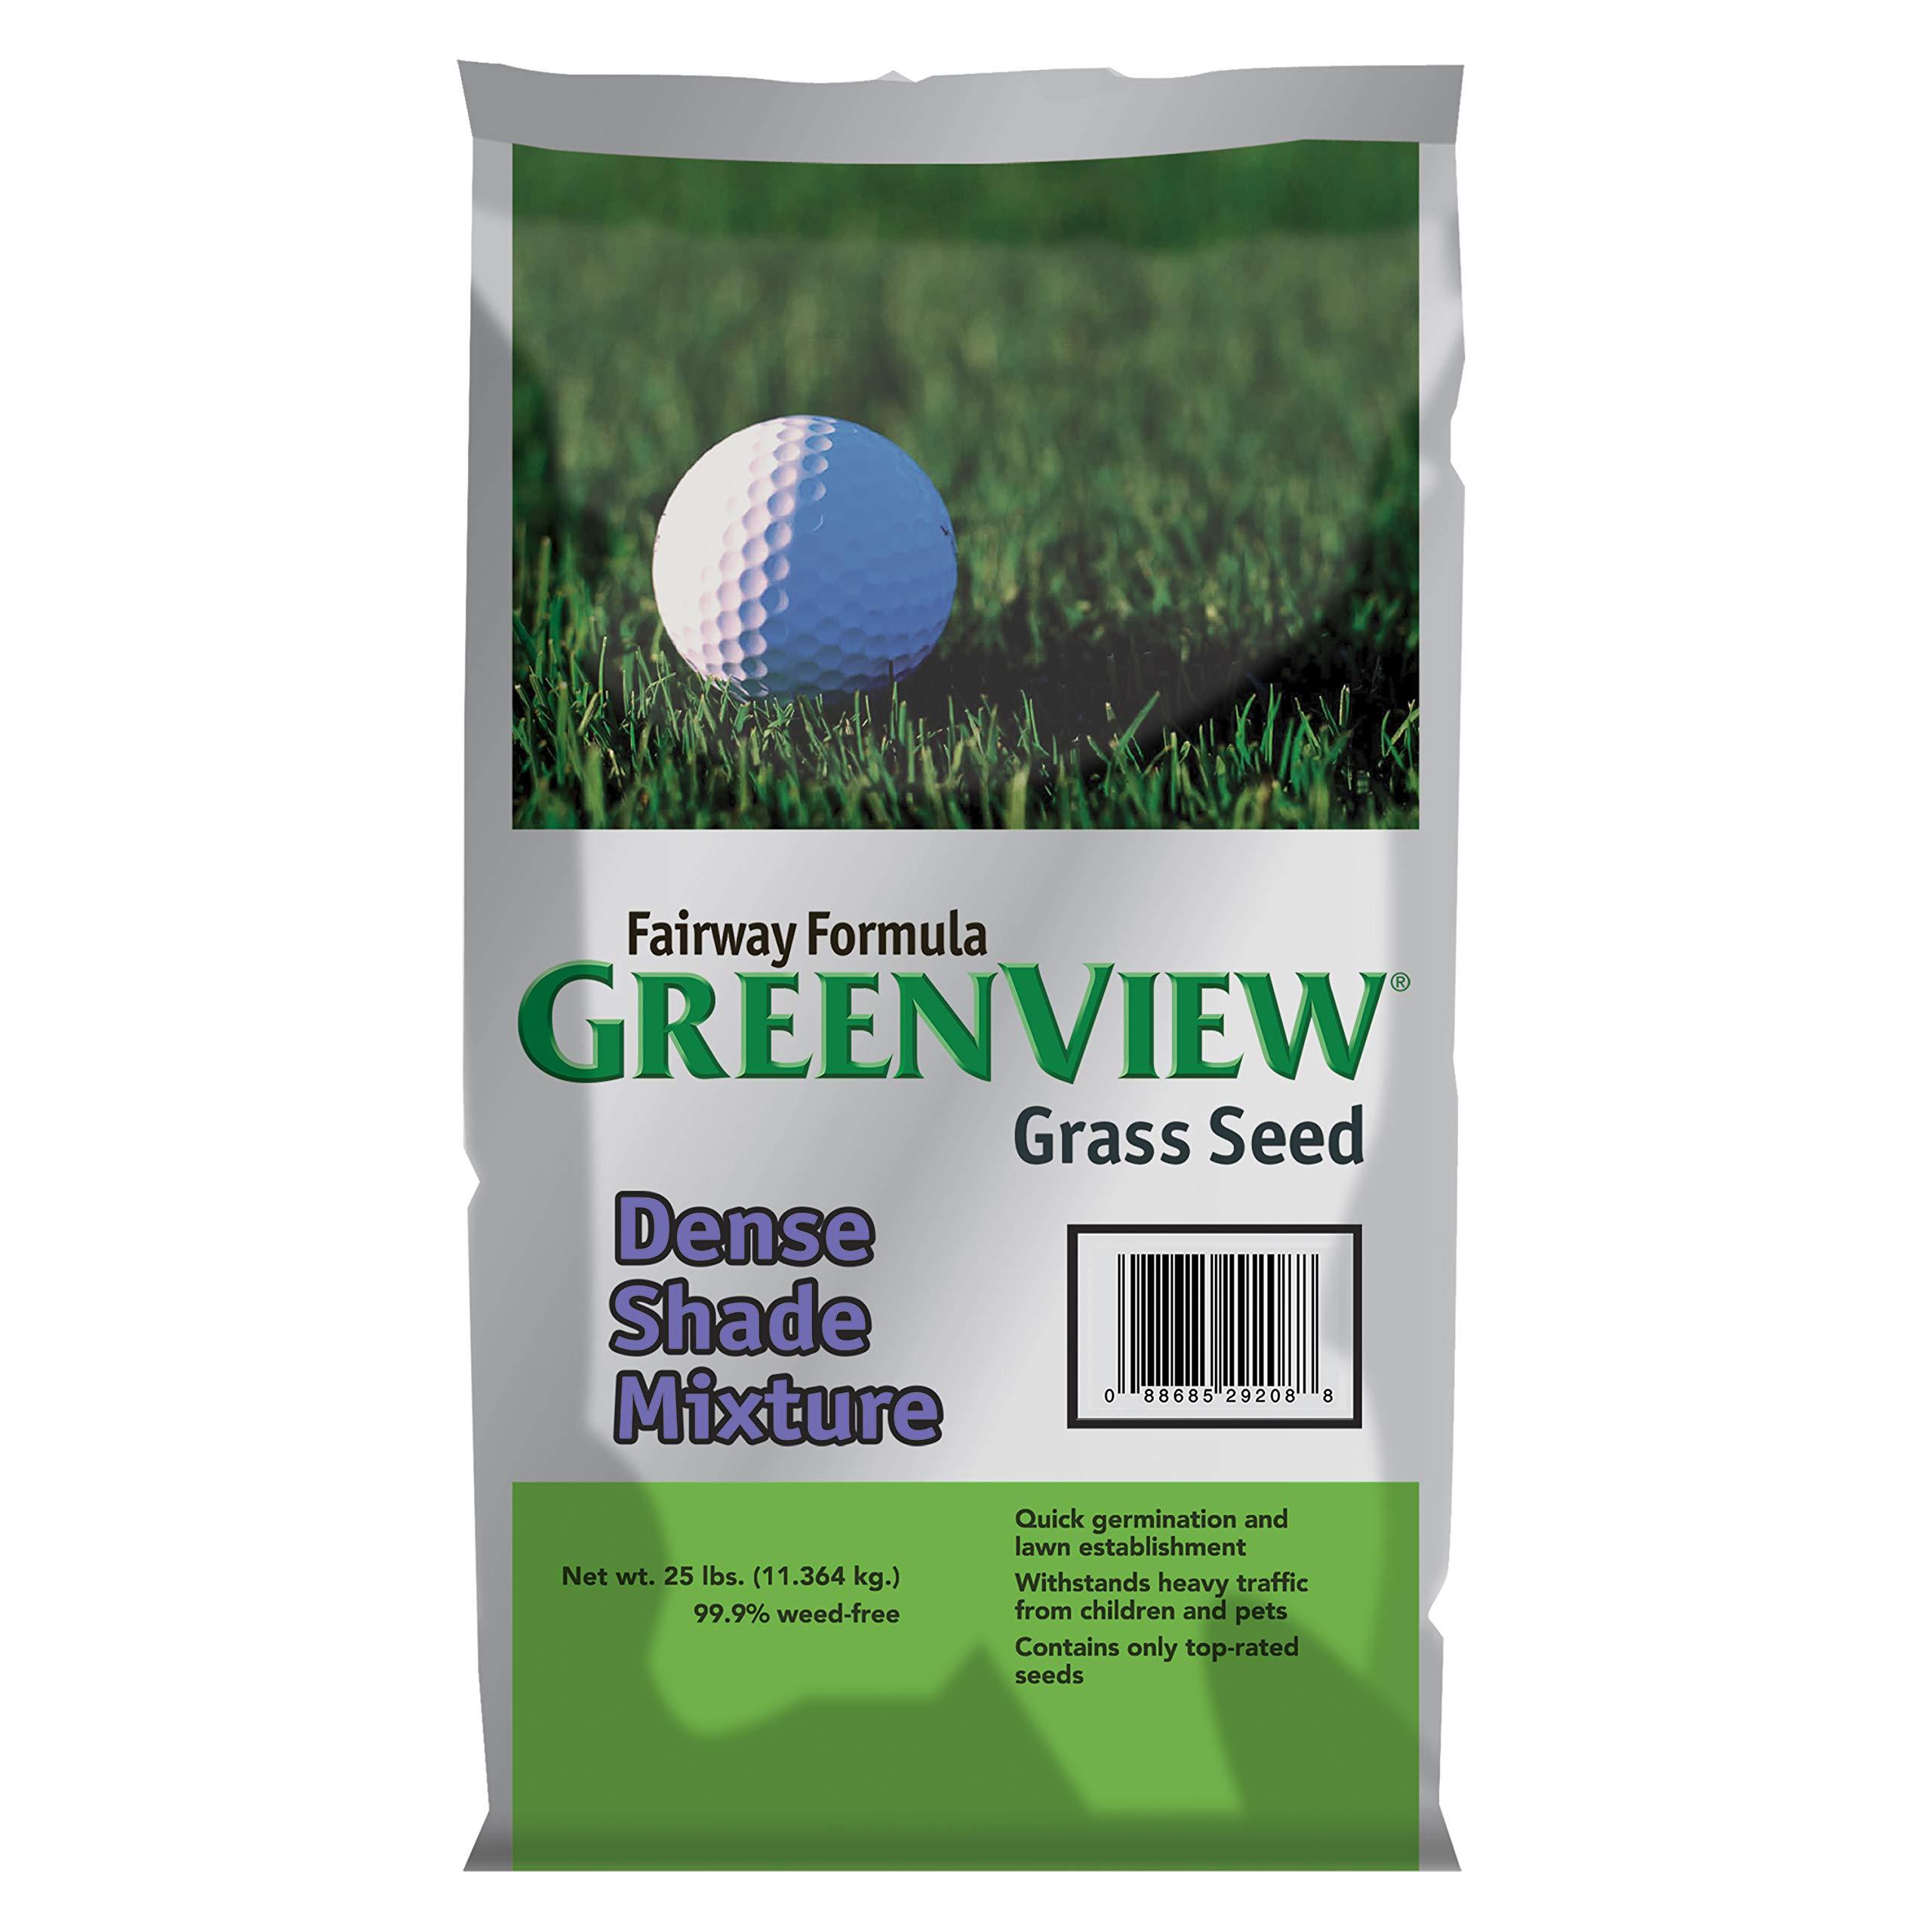 GreenView Fairway Formula Grass Seed Dense Shade Mixture, 25 lb Bag by Greenview (Image #1)